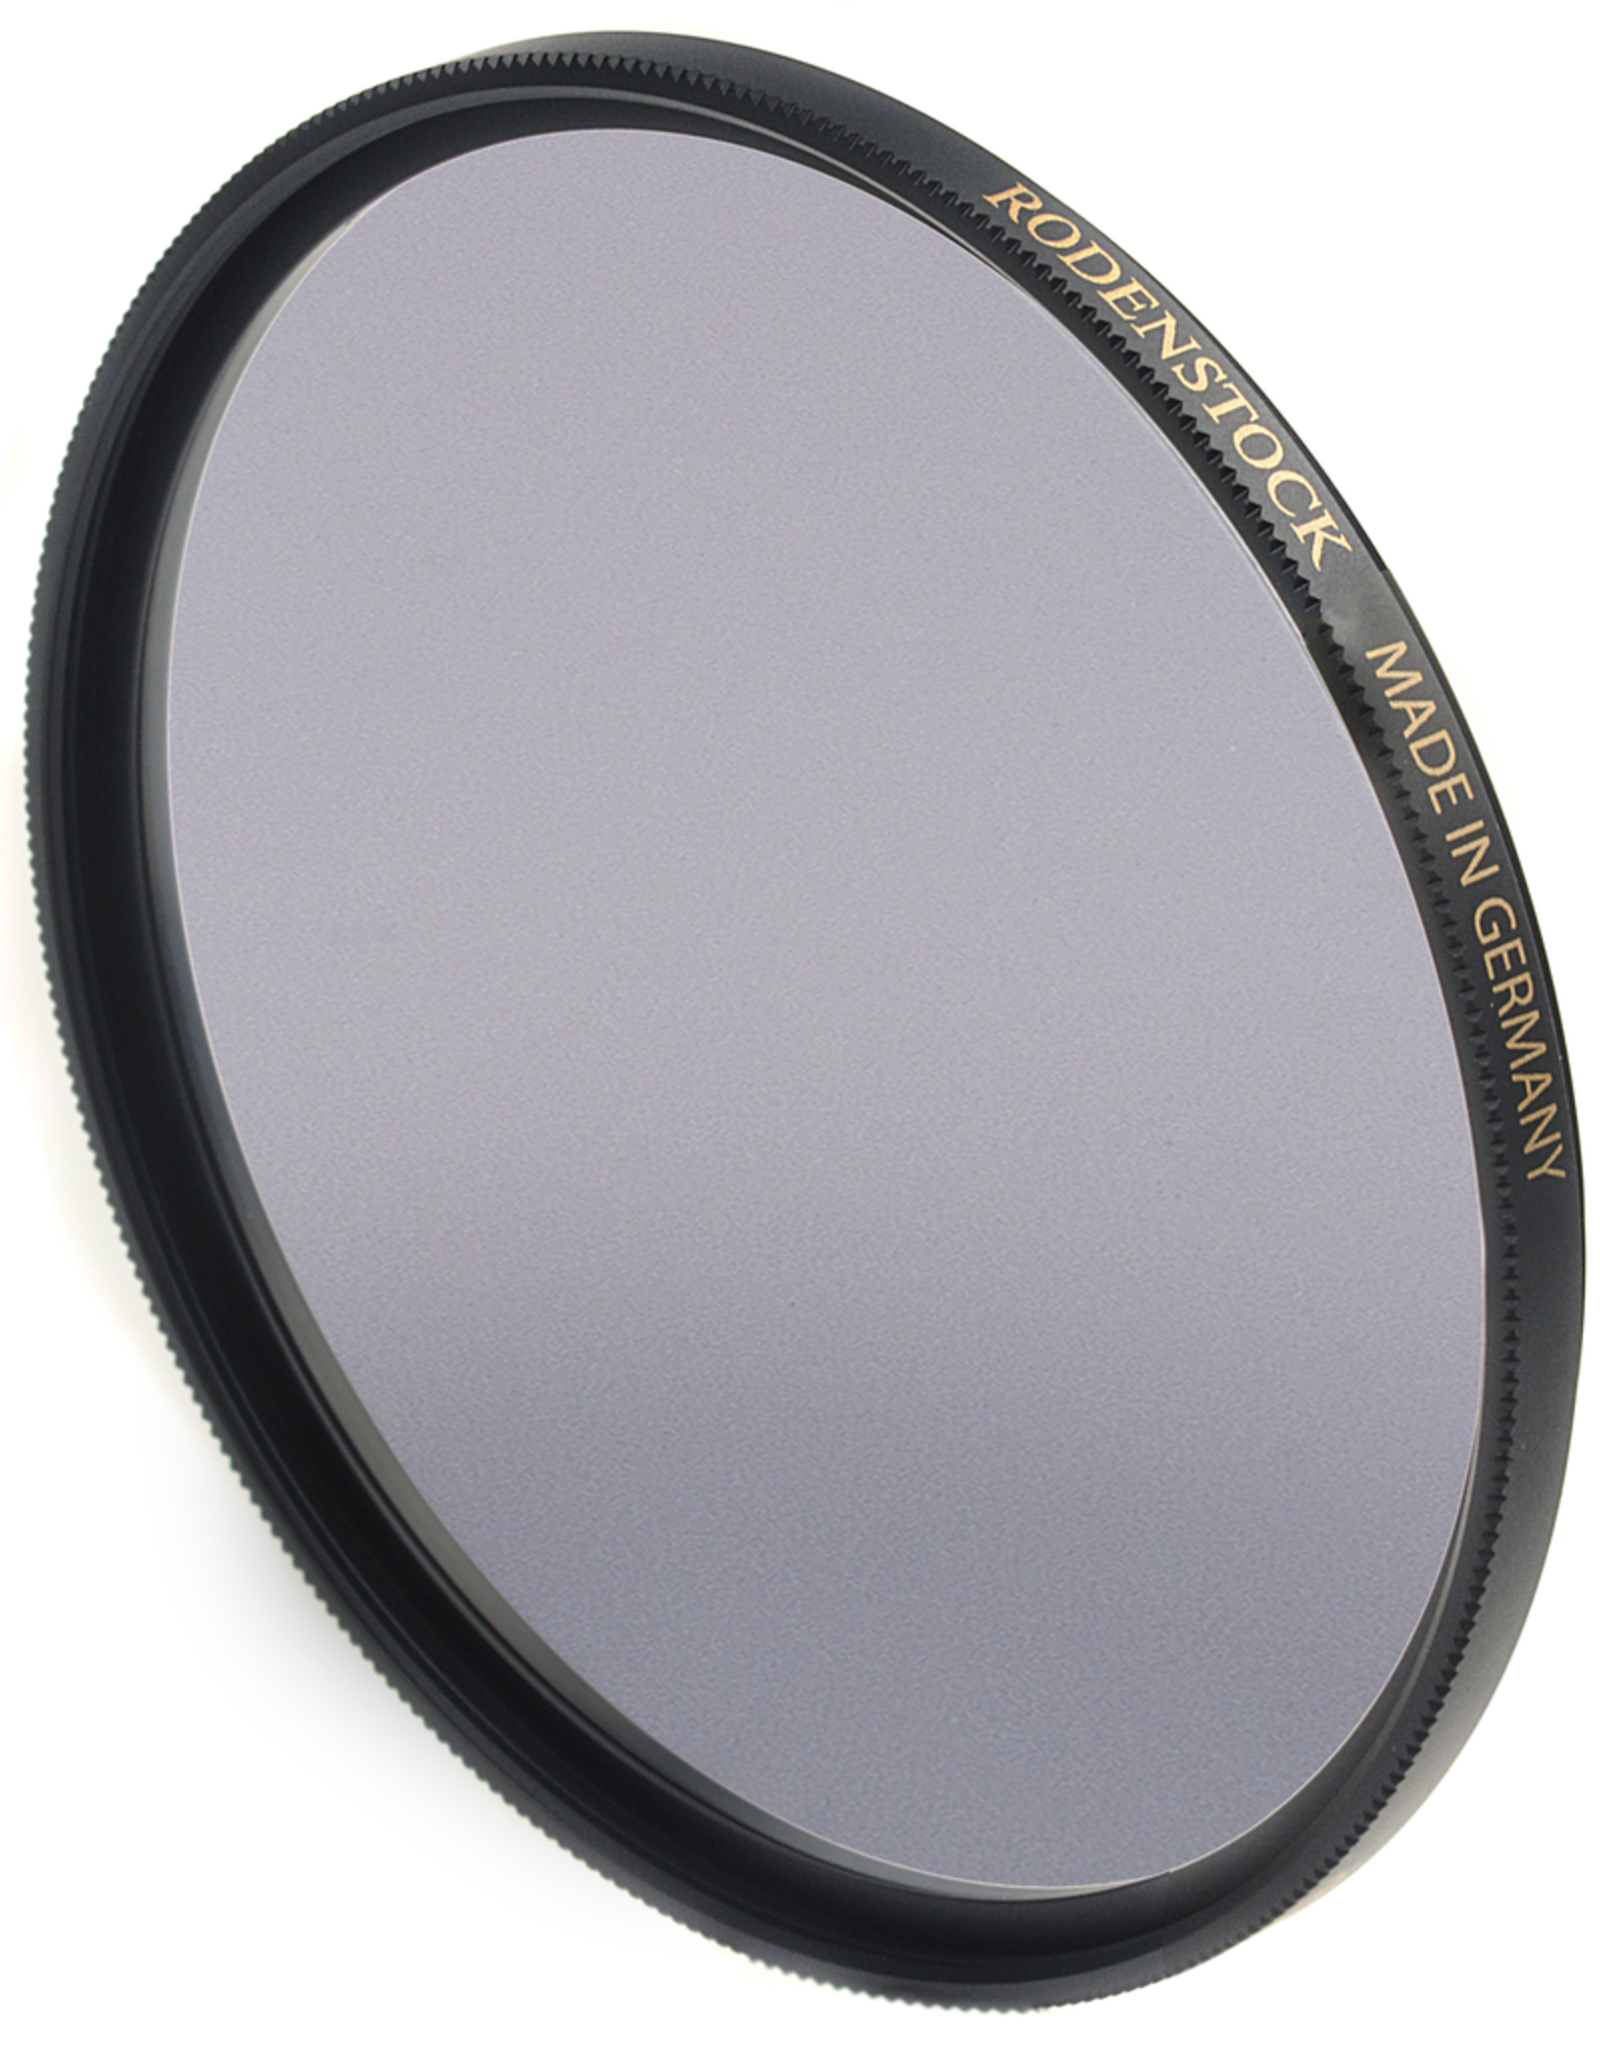 Rodenstock Rodenstock Polarizer HR Digital super MC, circular, Made in Germany,  72 mm